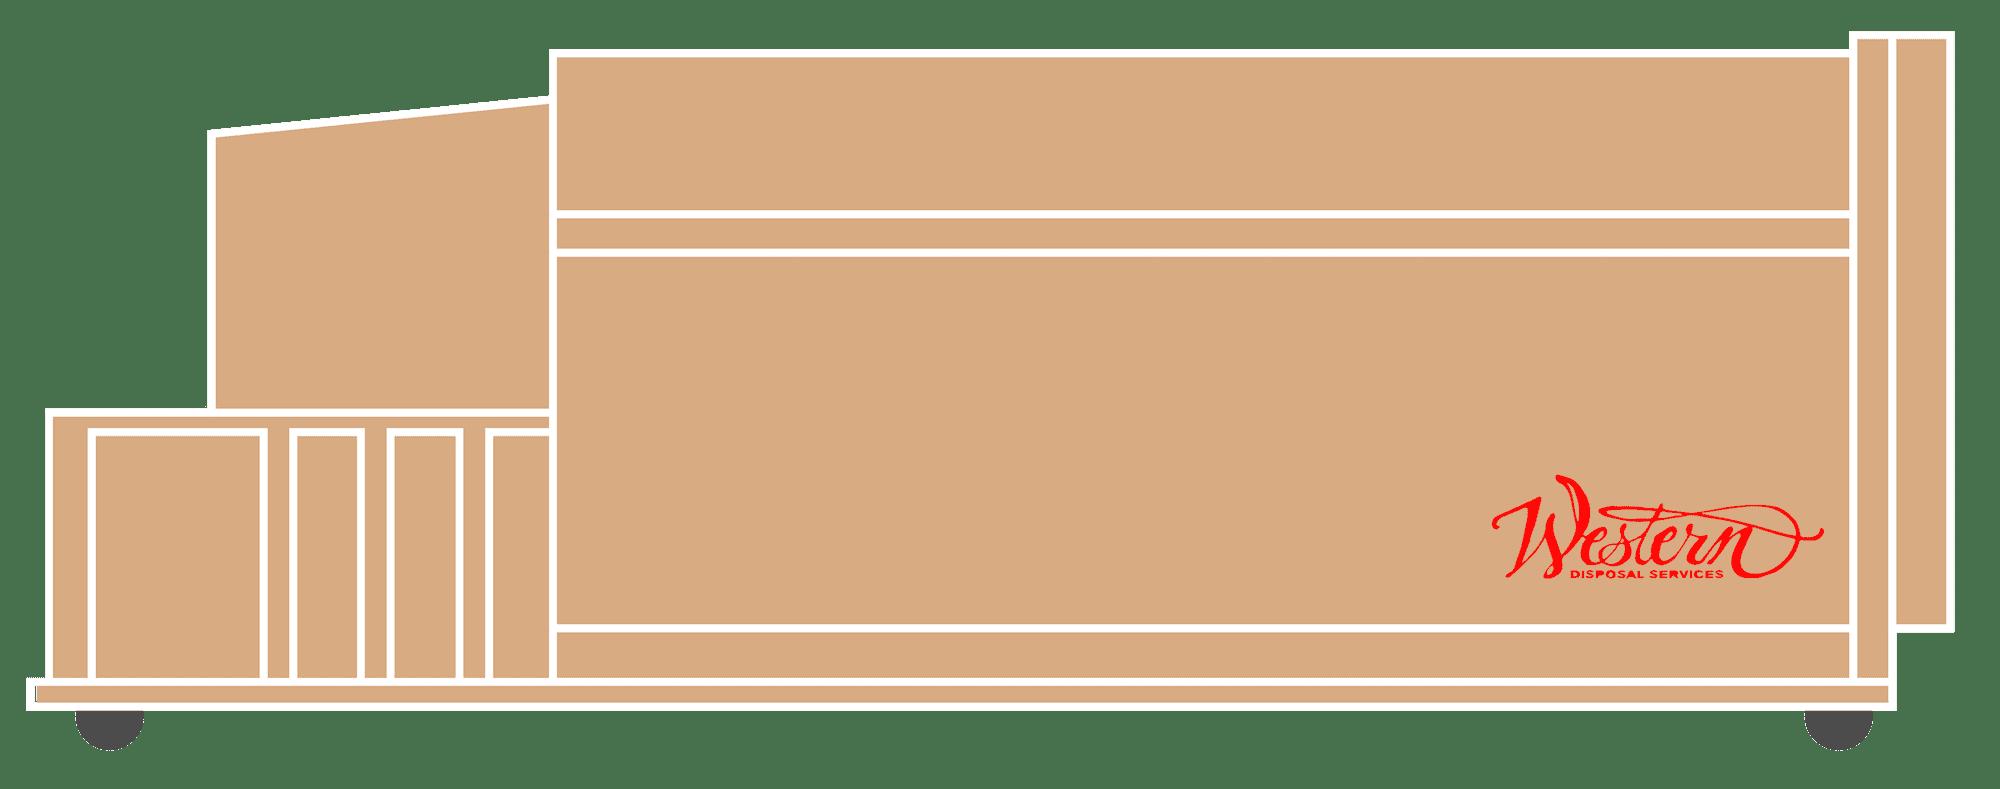 Compactor icon